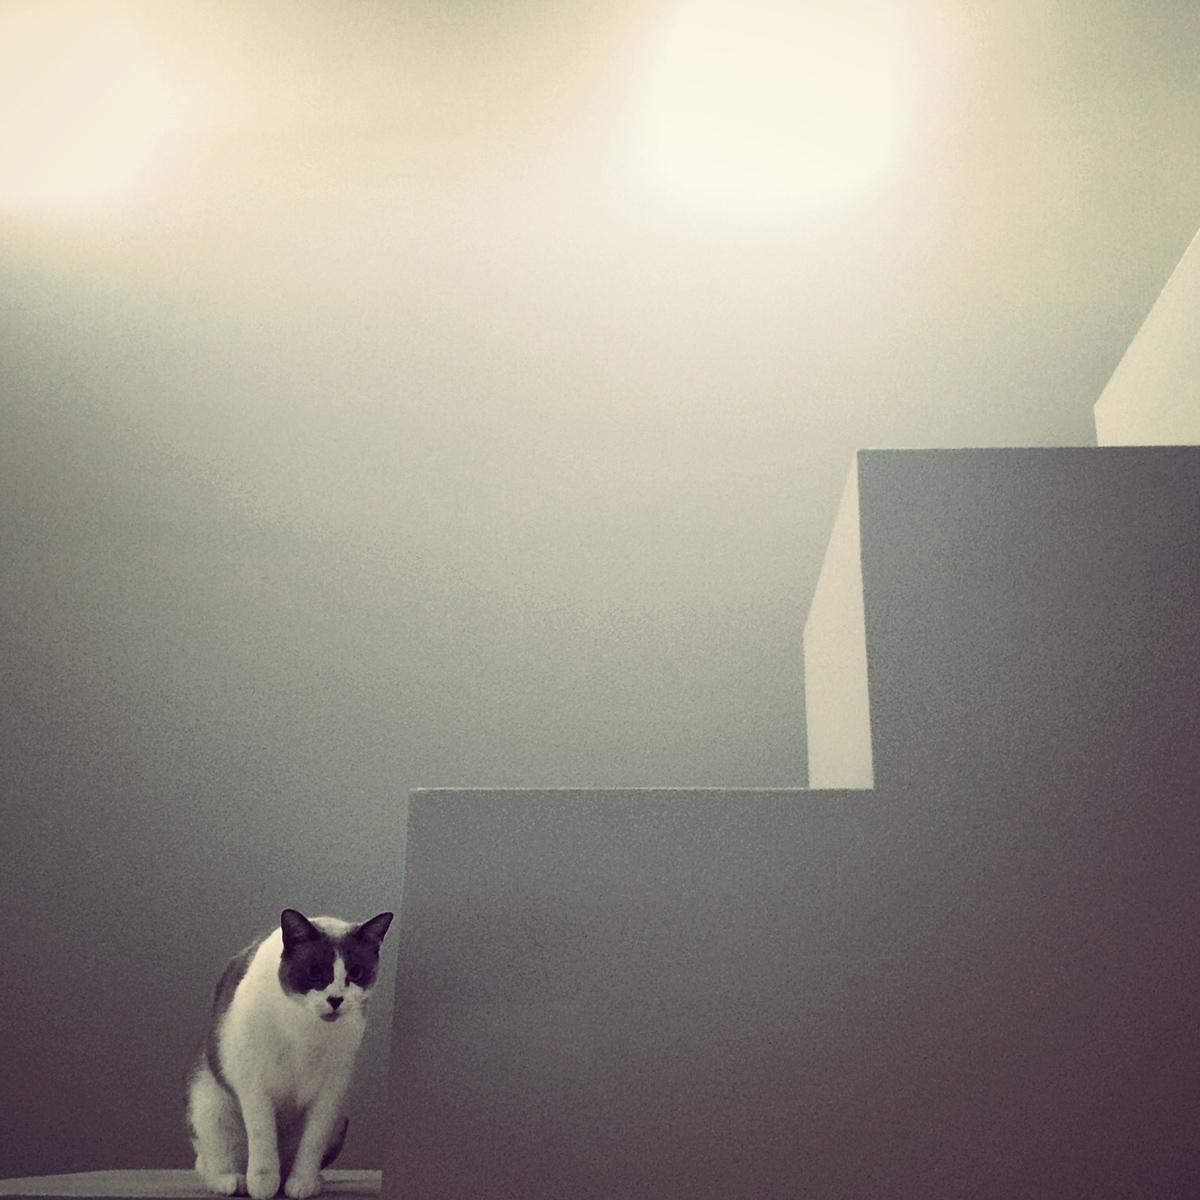 archi-cat  / lulu on the ledge